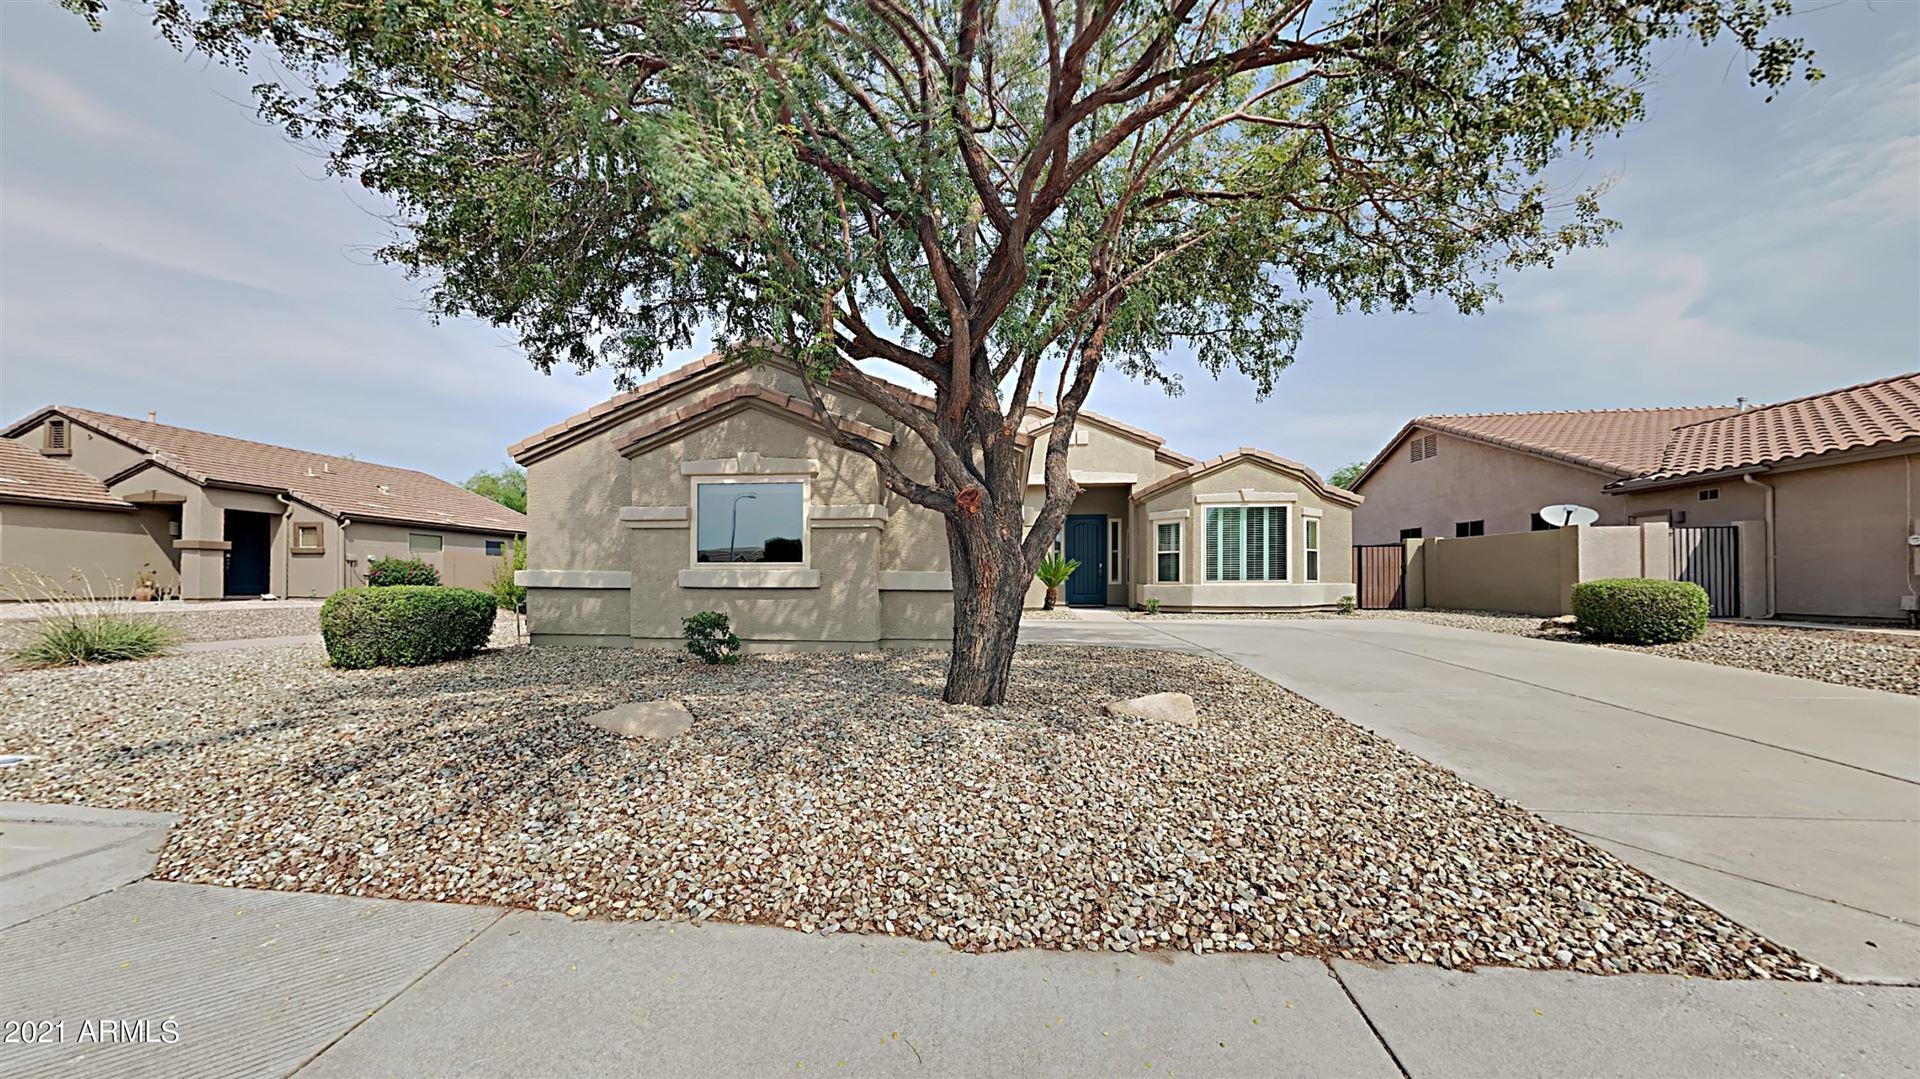 682 W MYRTLE Drive, Chandler, AZ 85248 - MLS#: 6270606